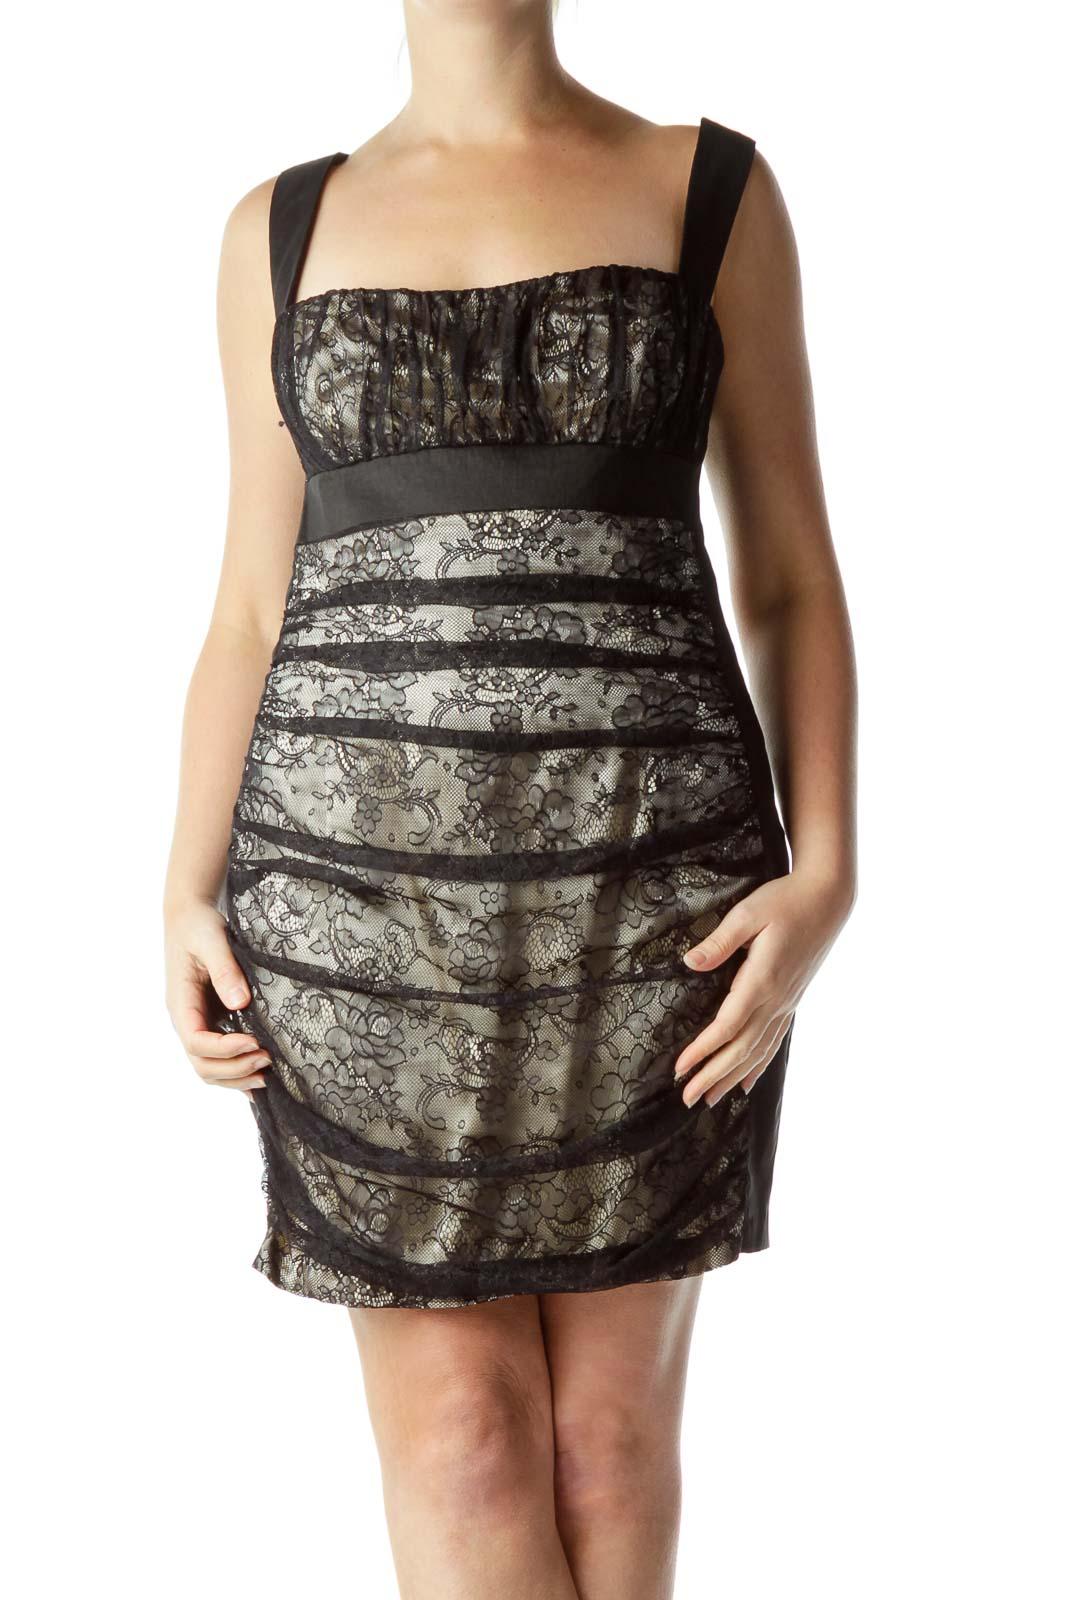 Black Lace Open-Back Cocktail Dress Front